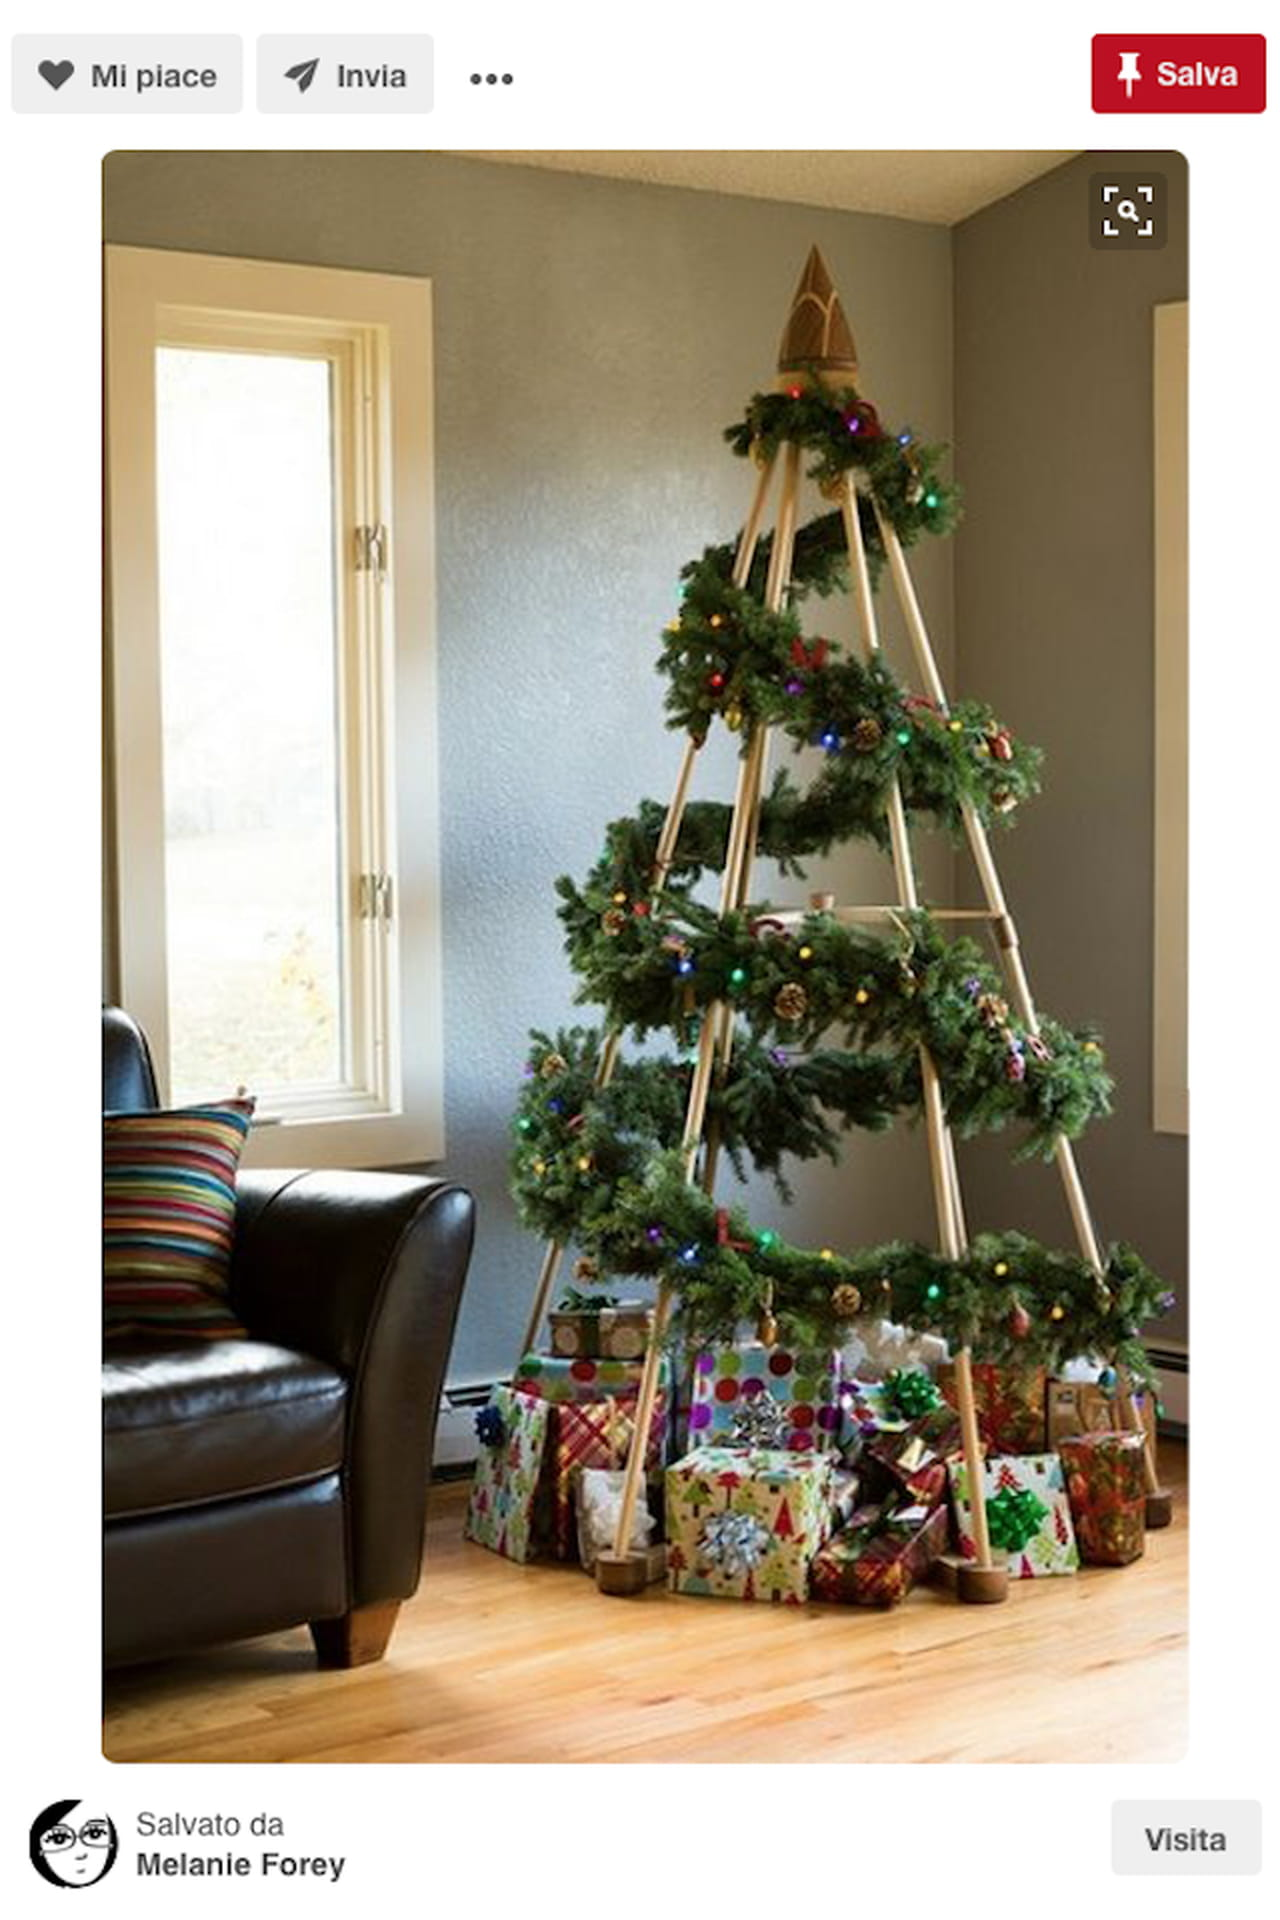 Ben noto Alberi di Natale: tradizionali o creativi? Spunti da Pinterest AW89